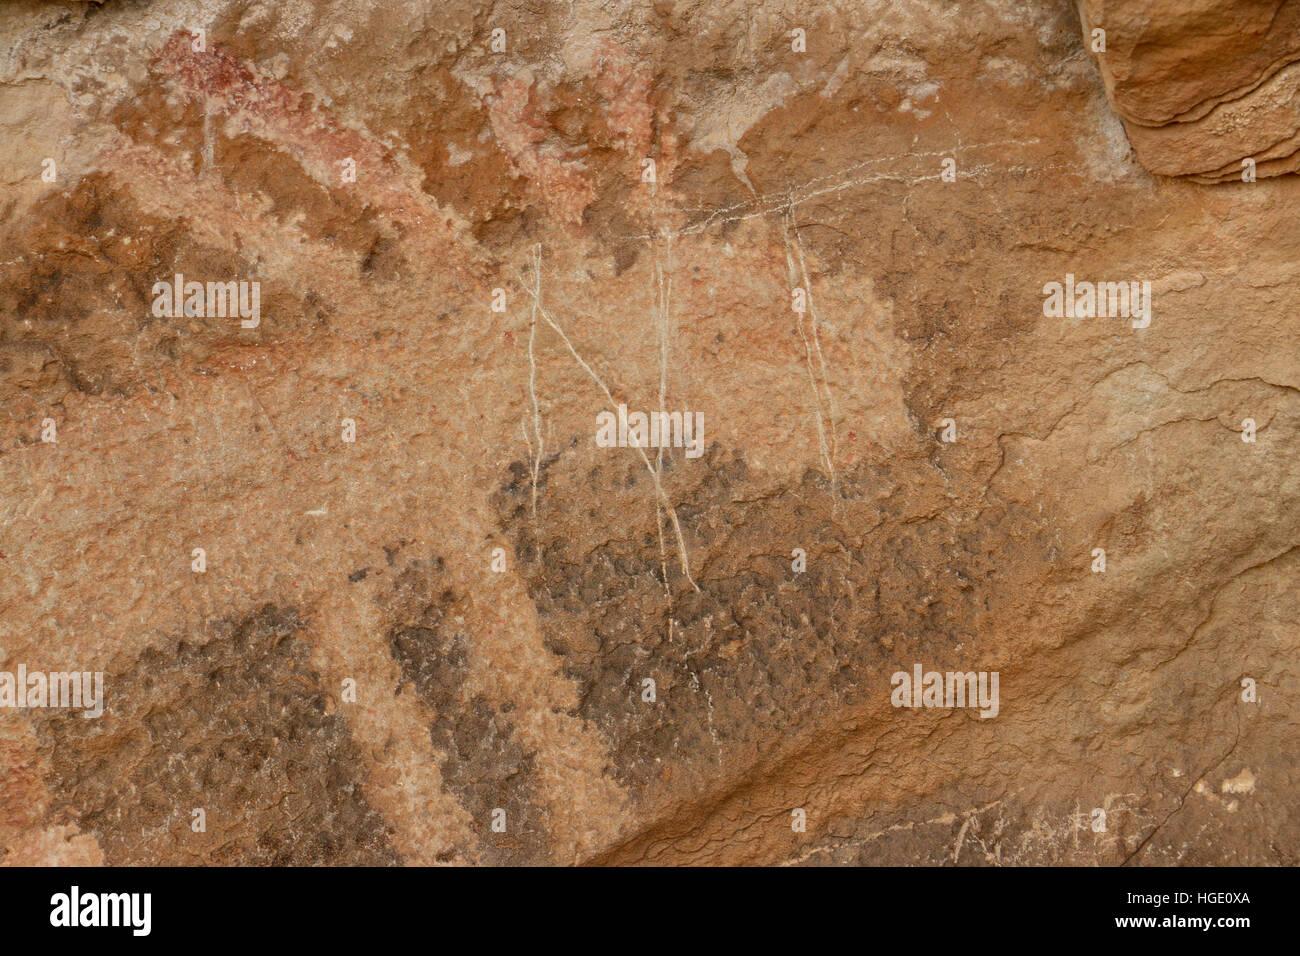 damage vandalism on Petroglyph sandstone rock Dinosaur National Monument Utah - Stock Image